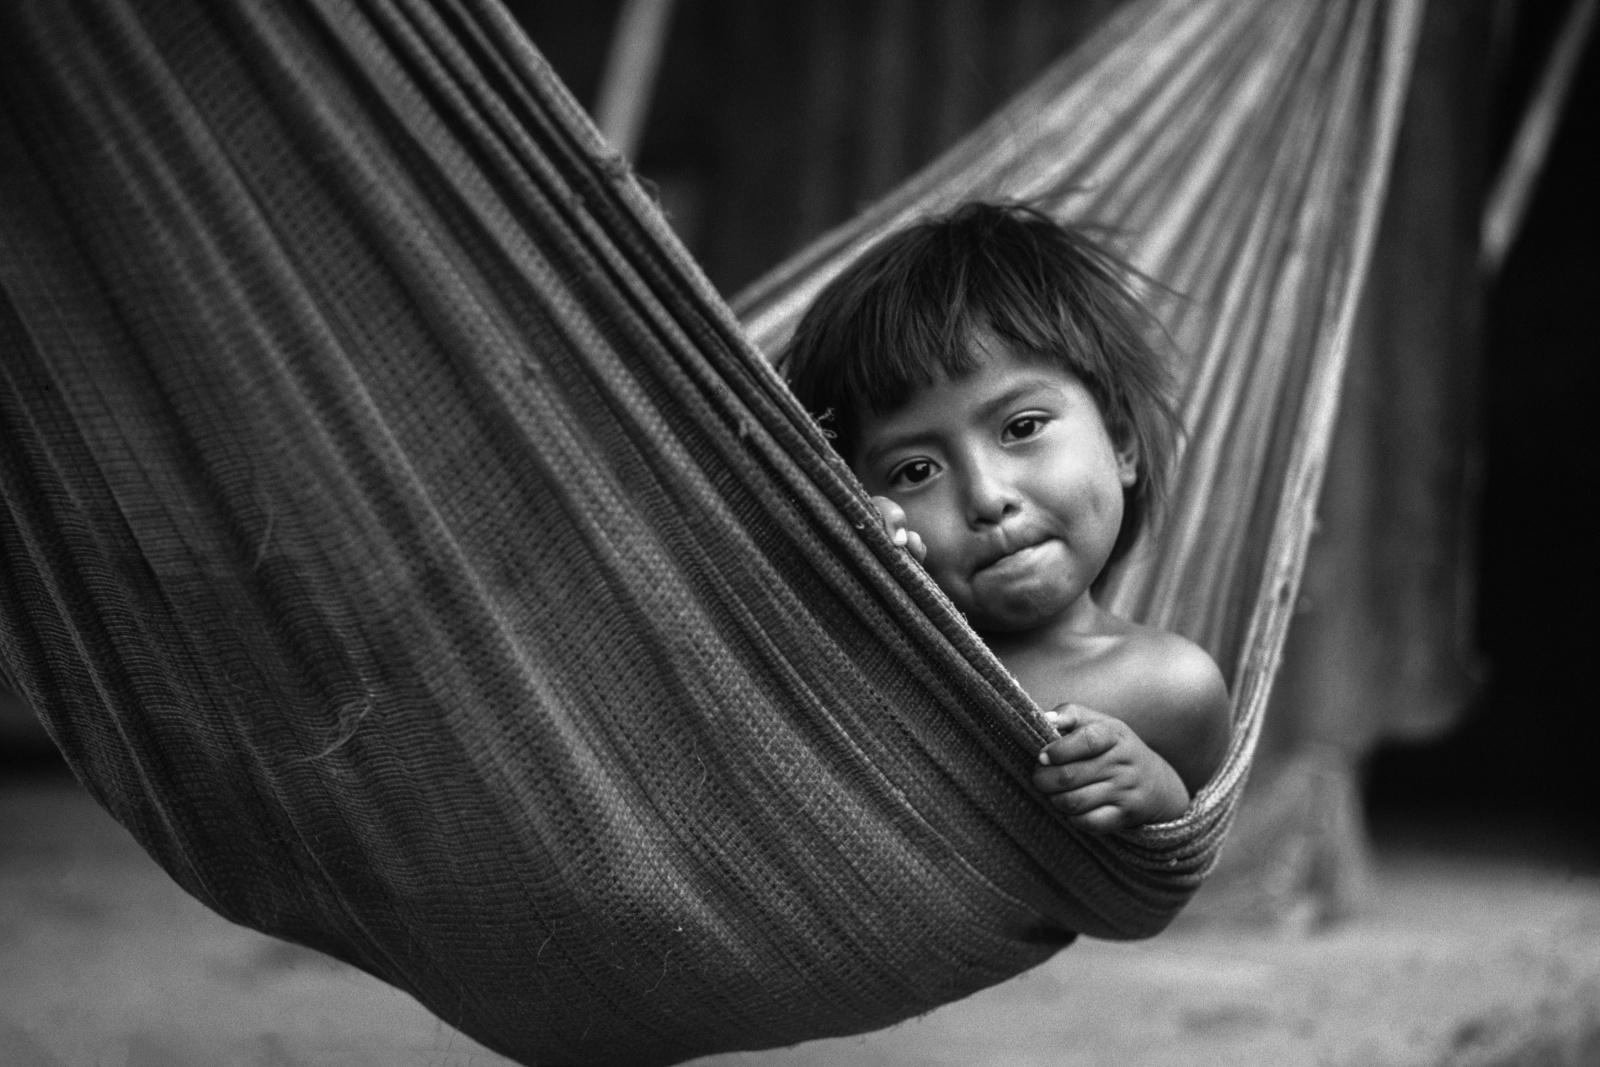 Nicaragua, bambini nel barrio a Managua